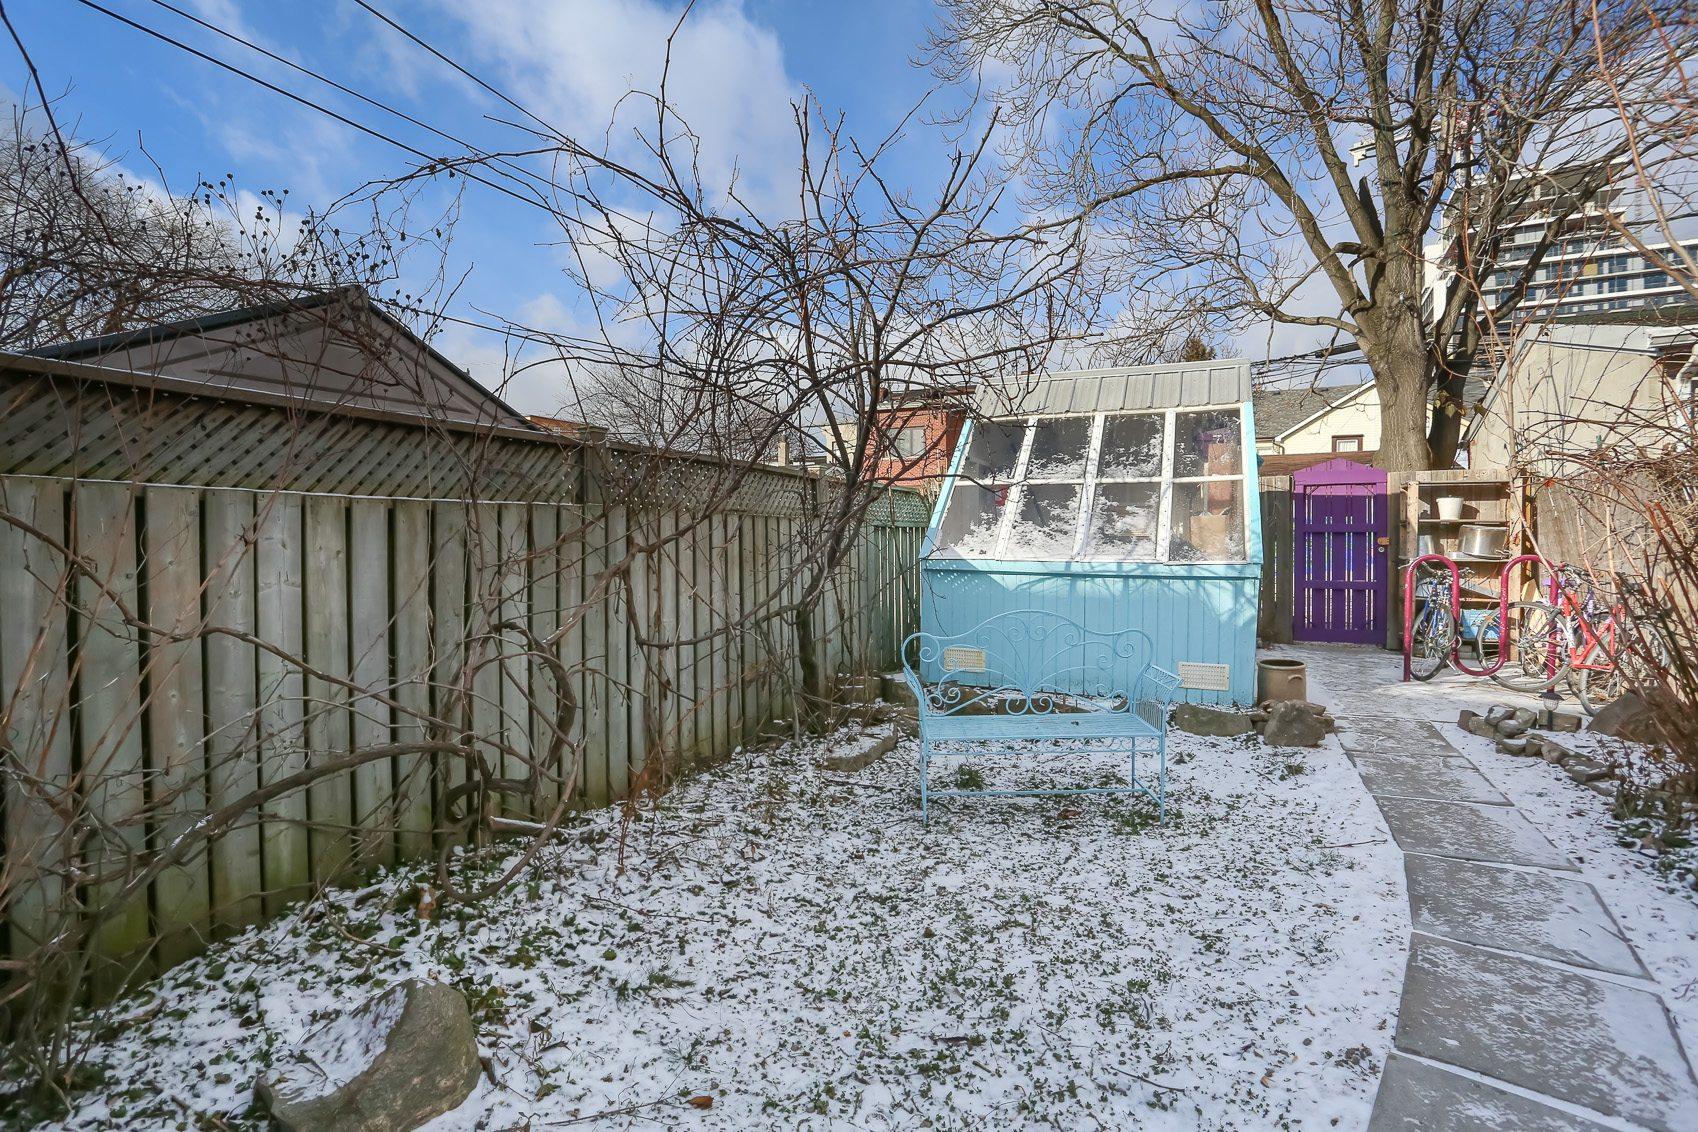 toronto-house-for-sale-44-nassau-street-19